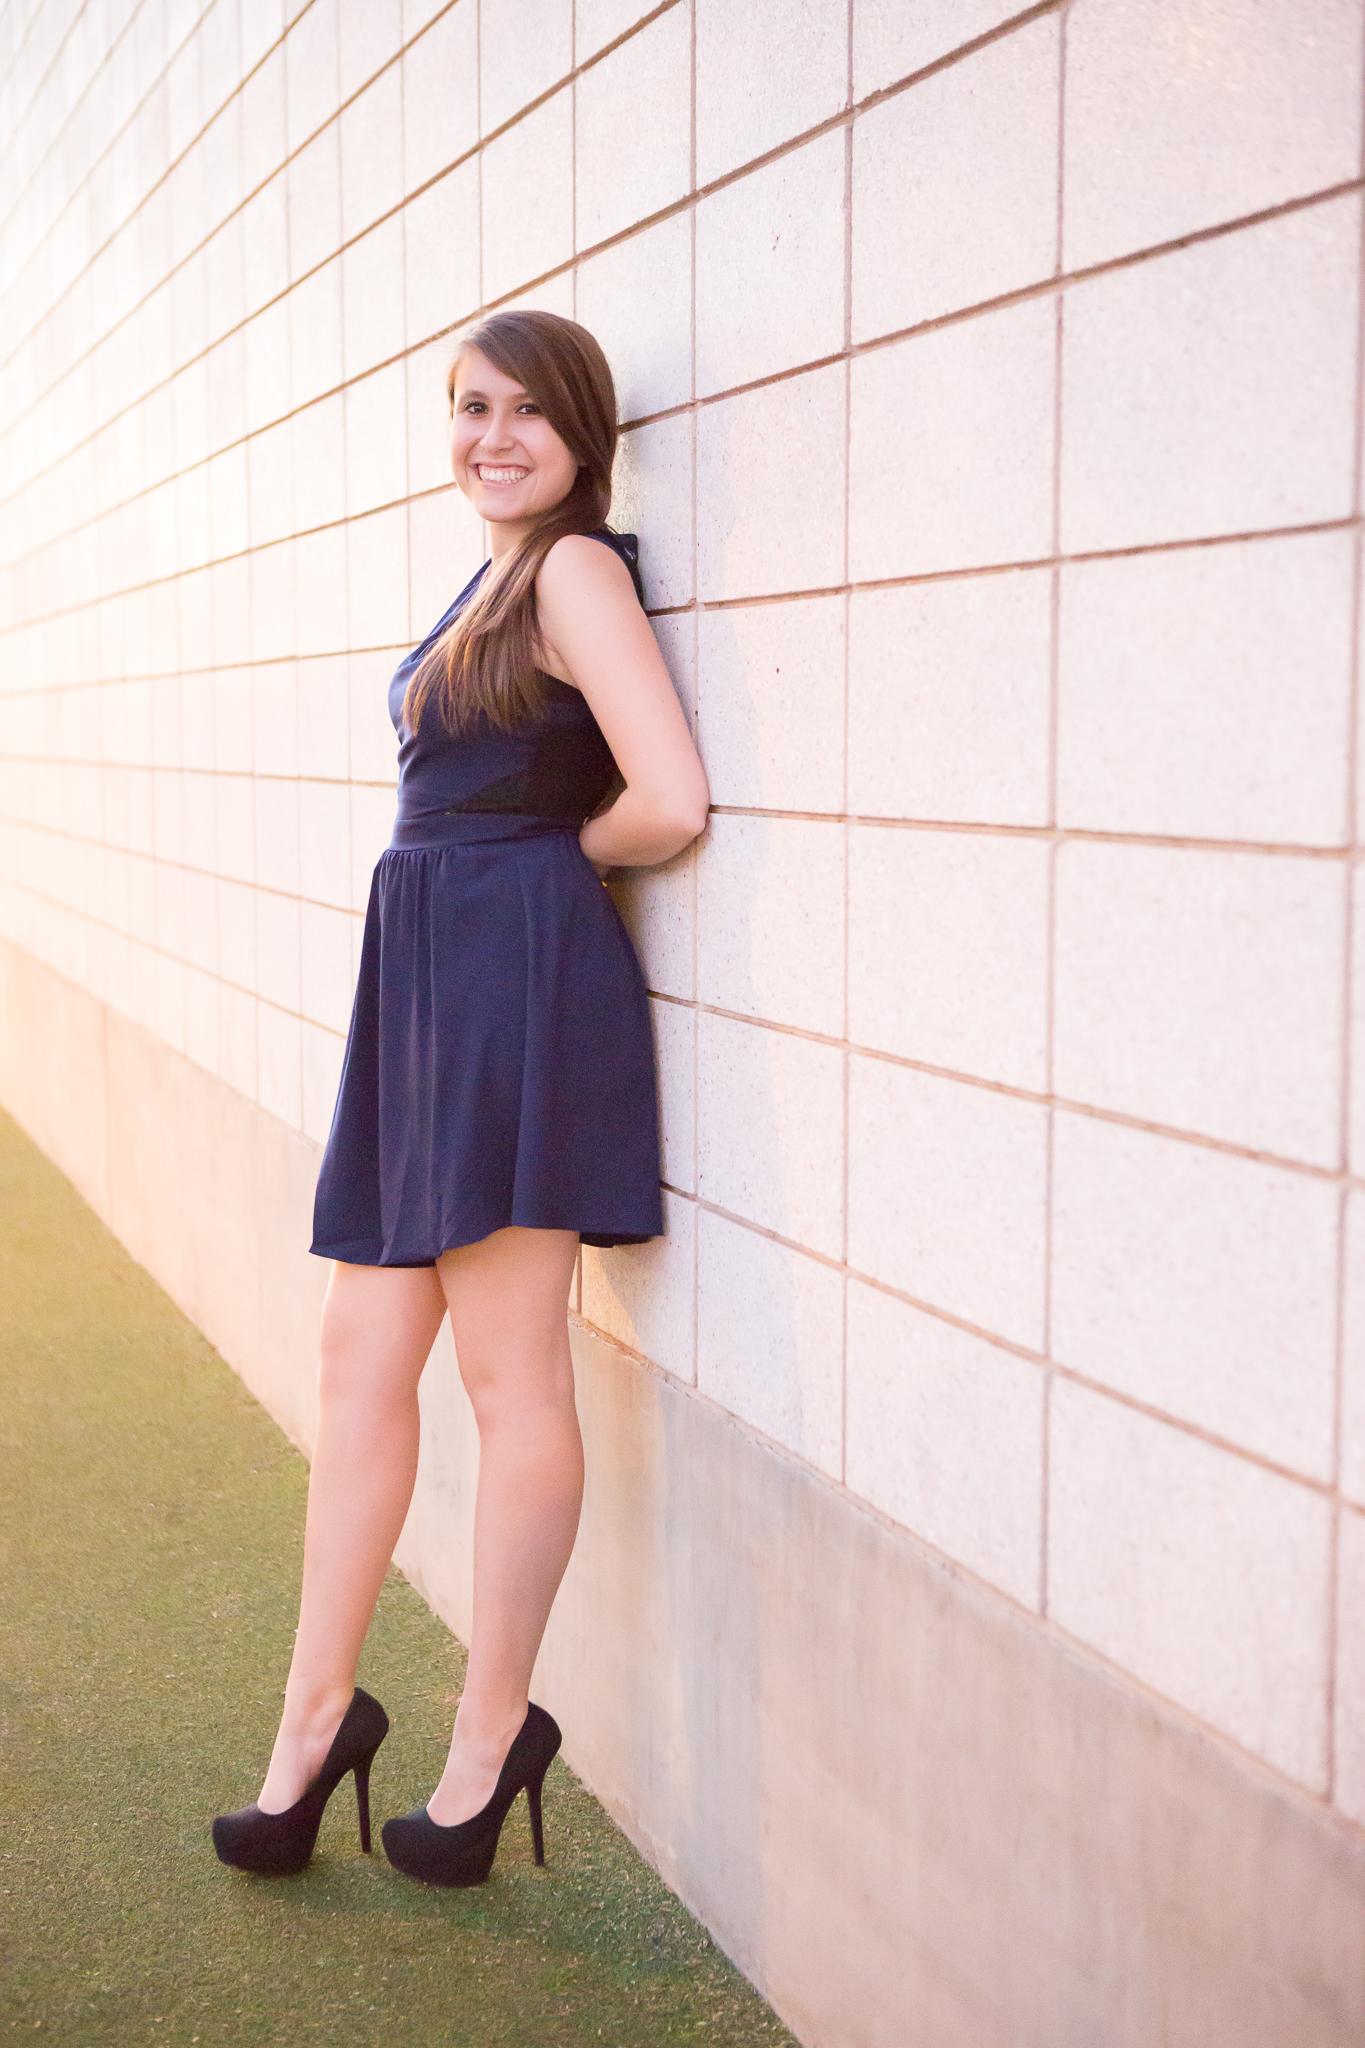 senior-photography-downtown-phoenix-purple-dress